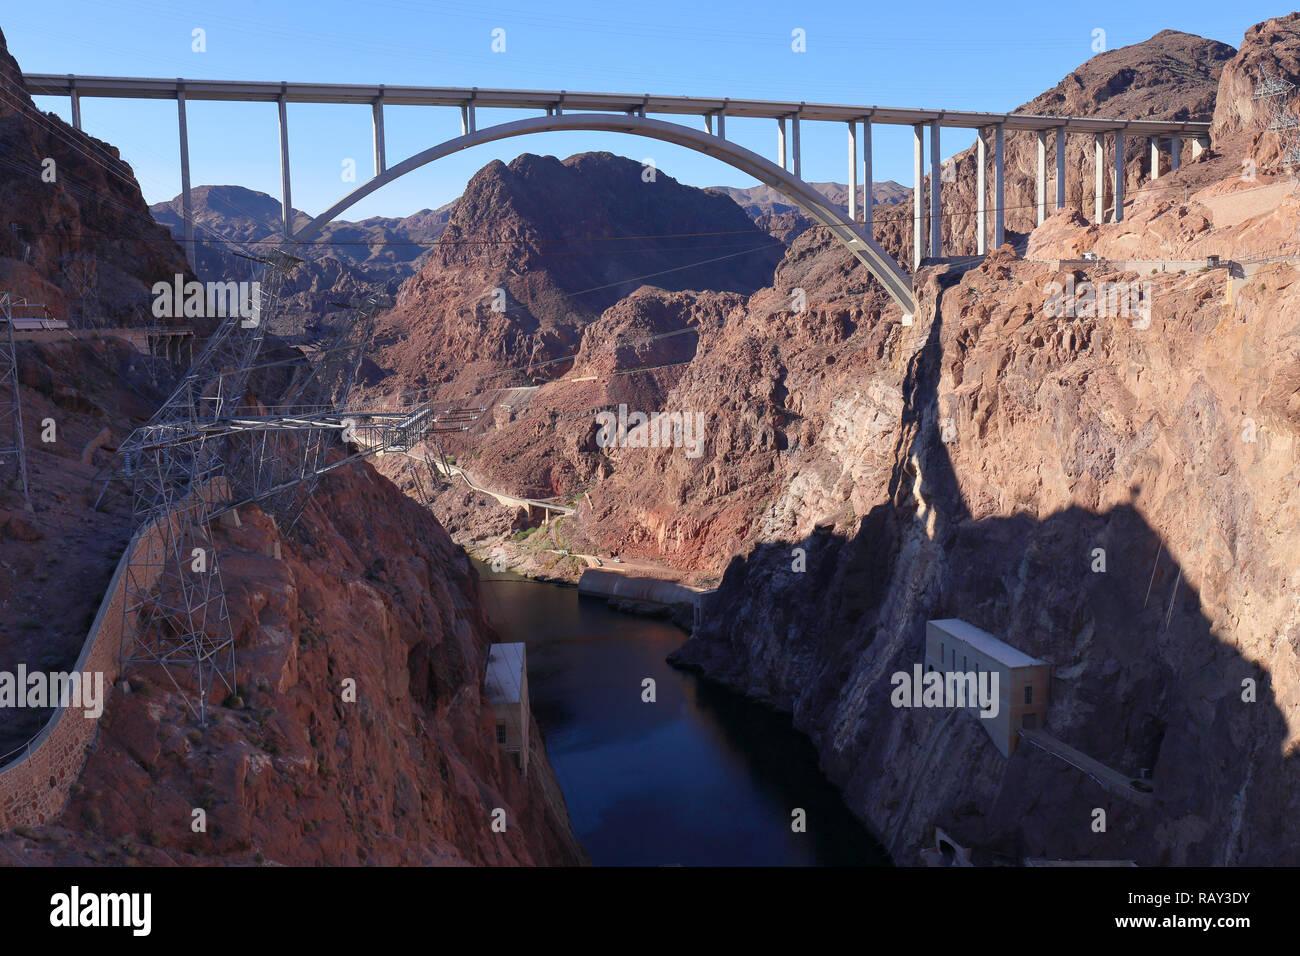 Memorial Bridge at Lake Mead, Nevada, USA Stock Photo